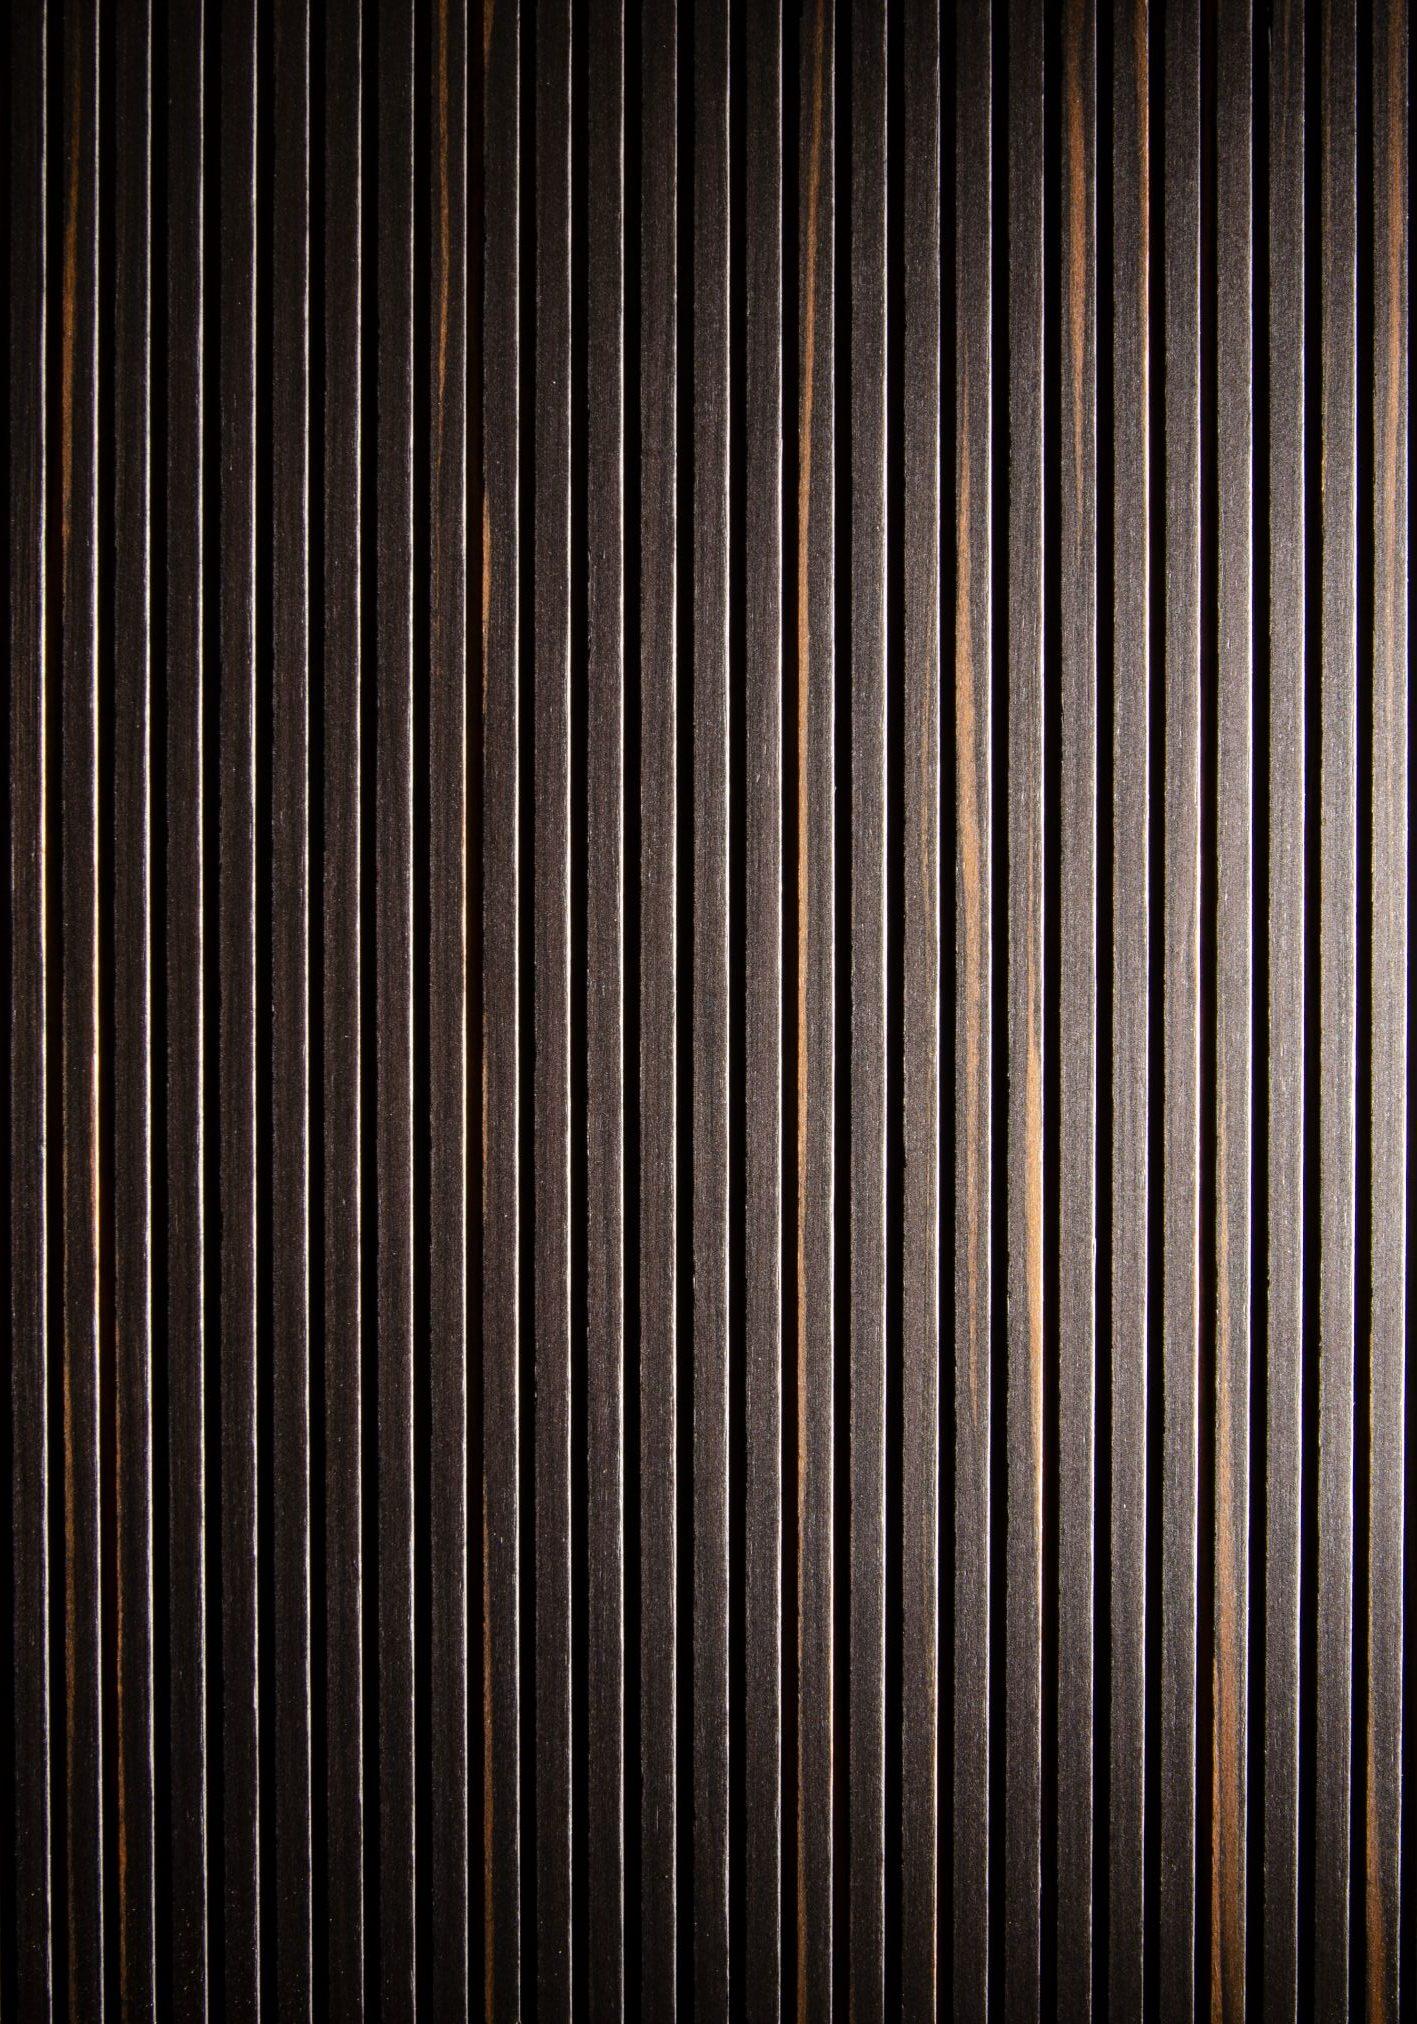 2610 - LIGHT - Ebony Maro - Alpi veneer